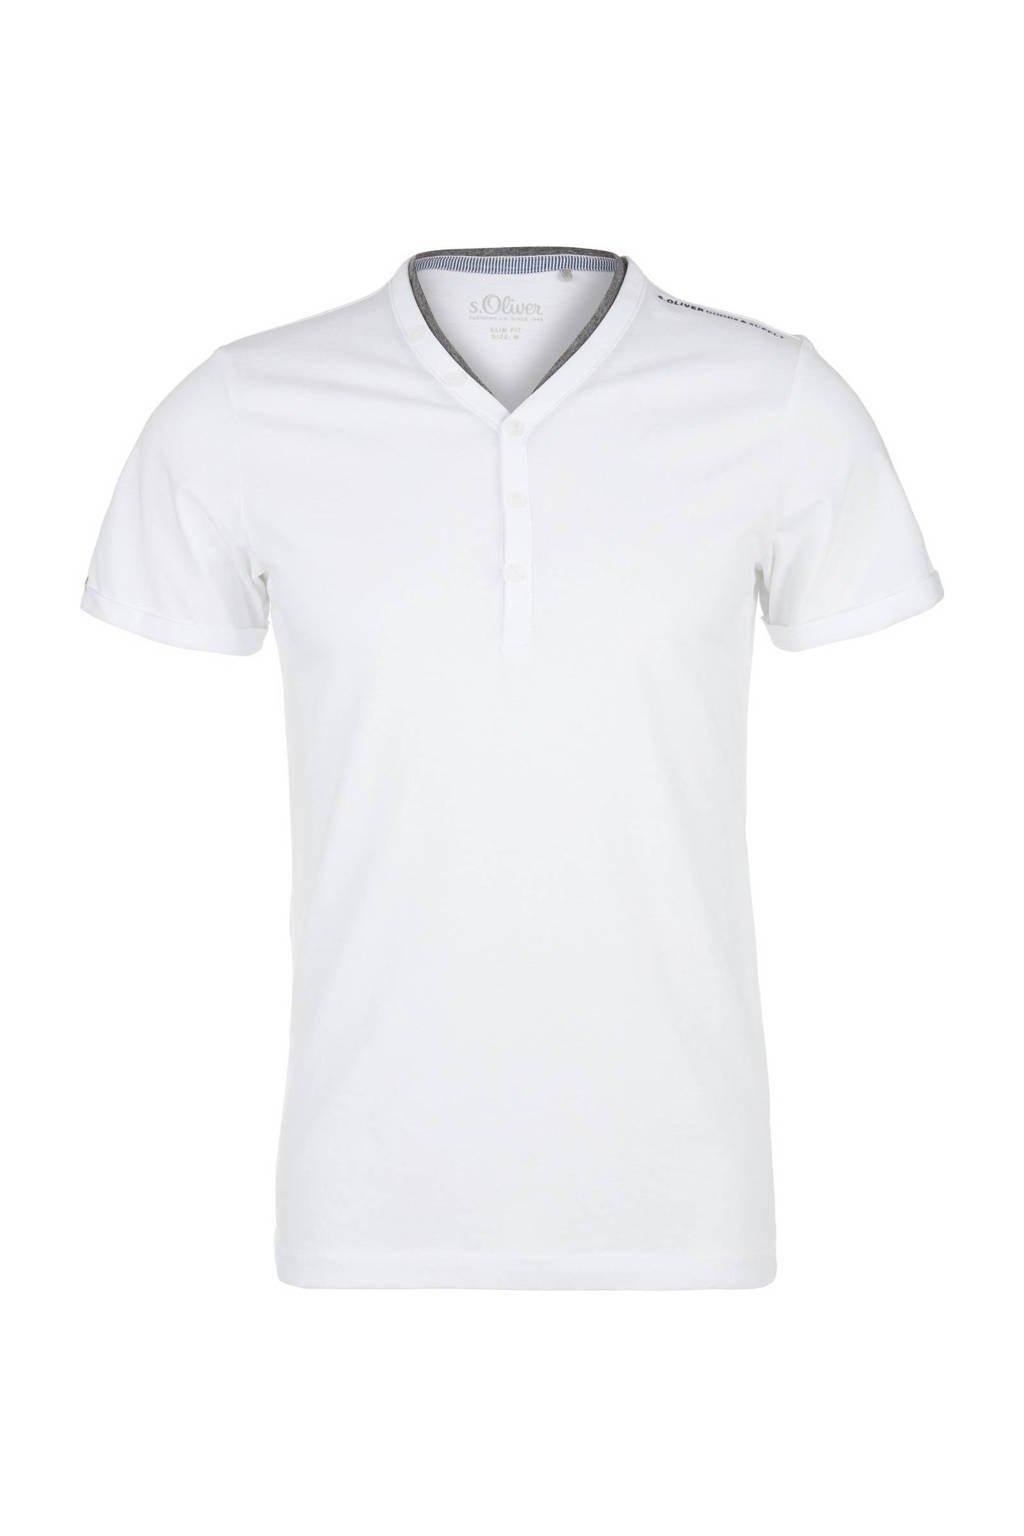 s.Oliver T-shirt wit, Wit